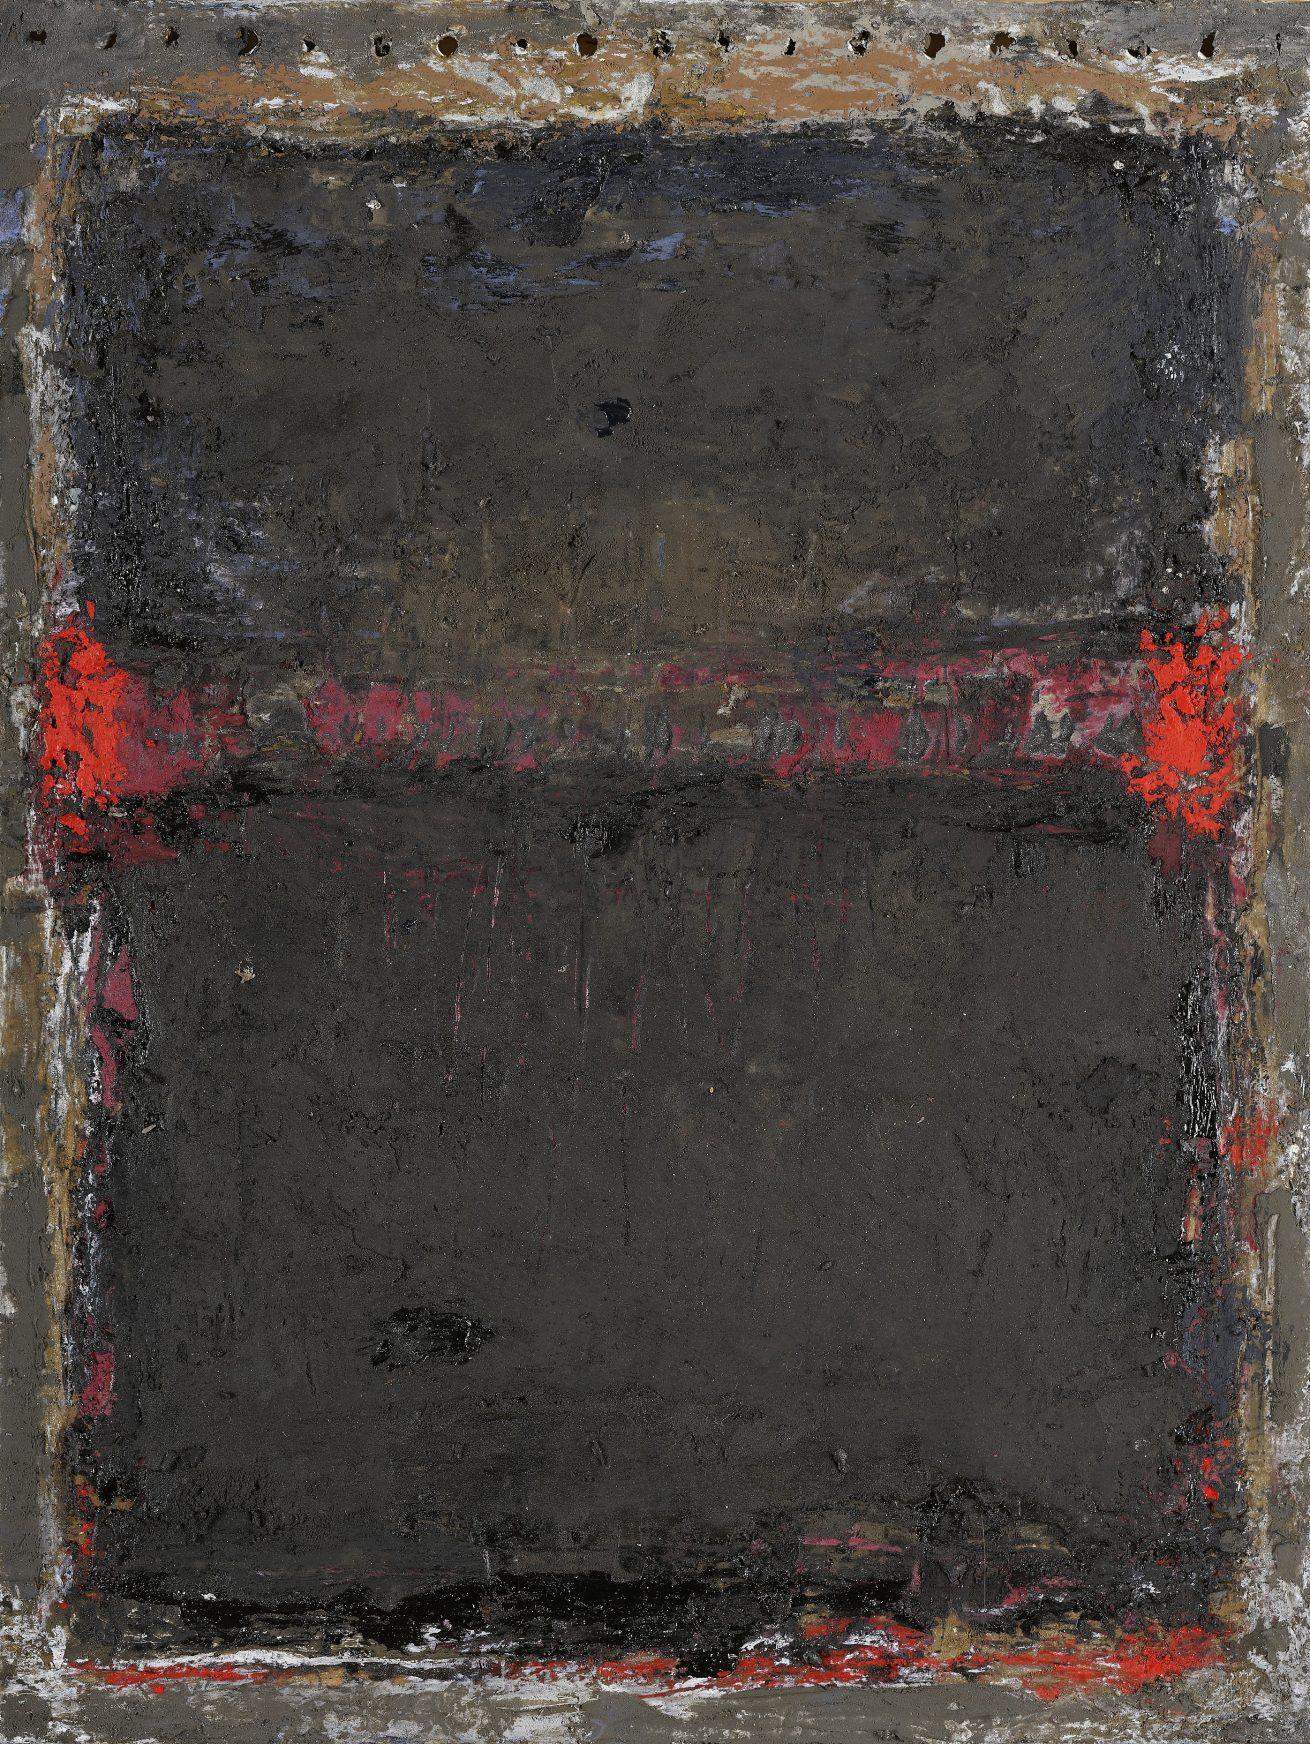 'Terre brûlée' Huile sur carton dim 24 x 32 cm